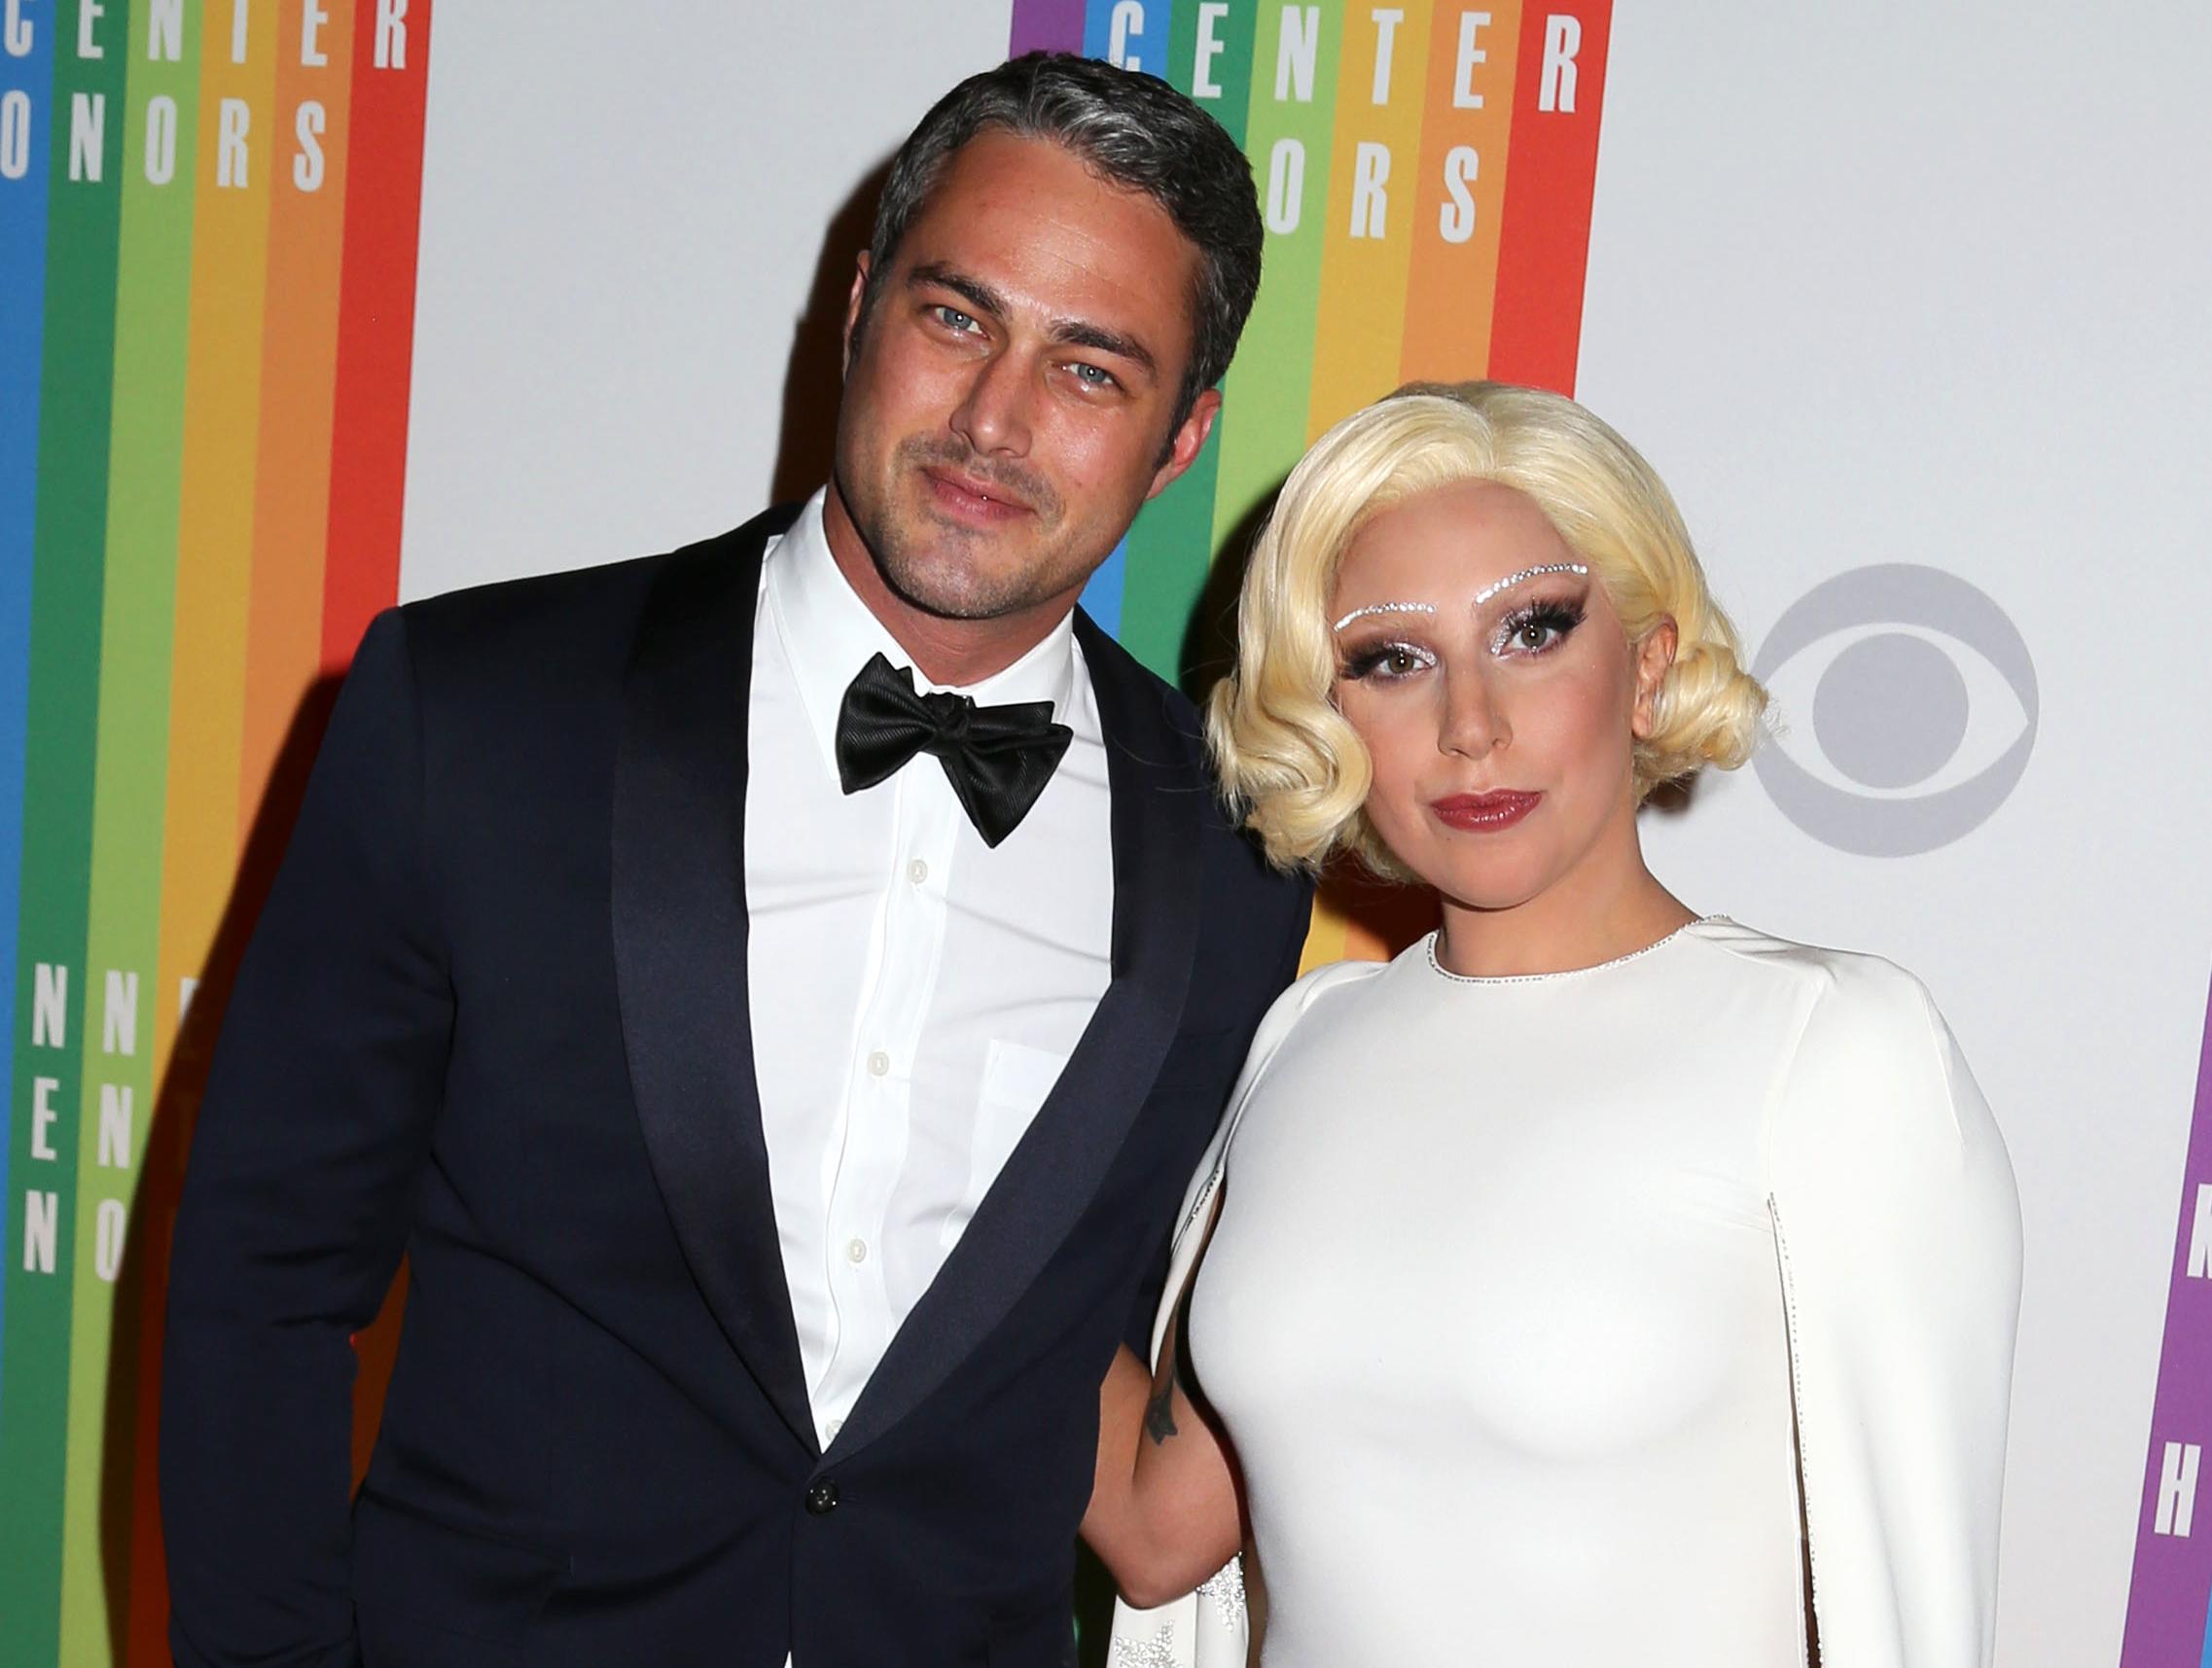 Wallpaper Celebrity Lady Gaga Couple Flooring Taylor Kinney Red Carpet 2274x1715 Goodfon 557809 Hd Wallpapers Wallhere